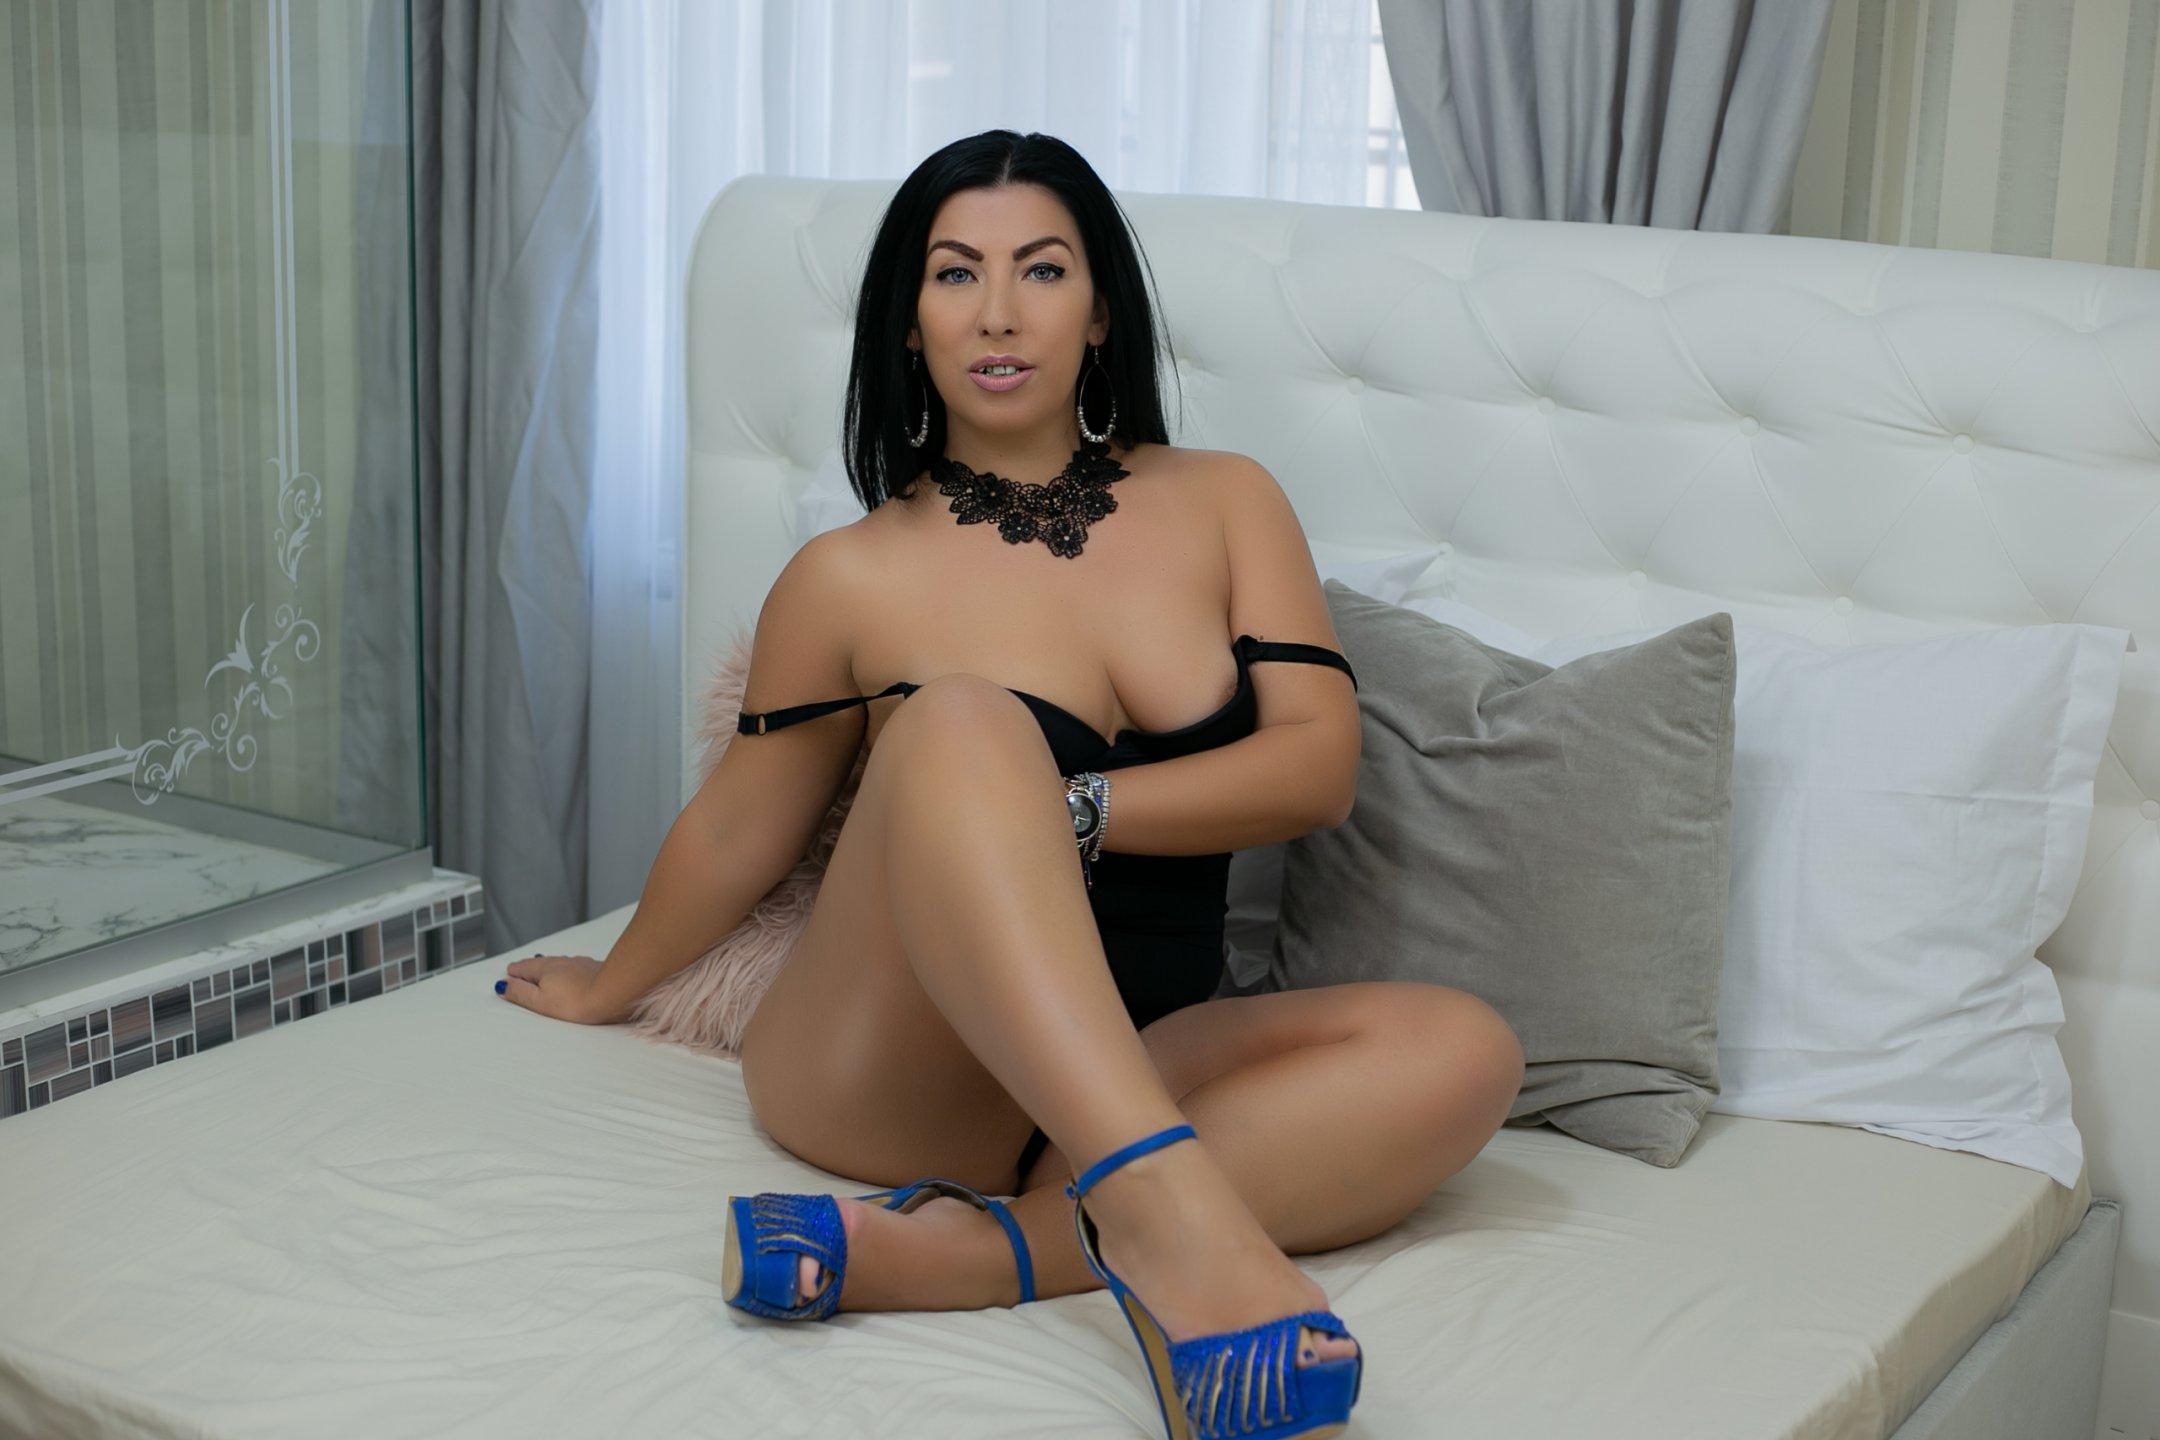 angielski sex videyo heban anel seks